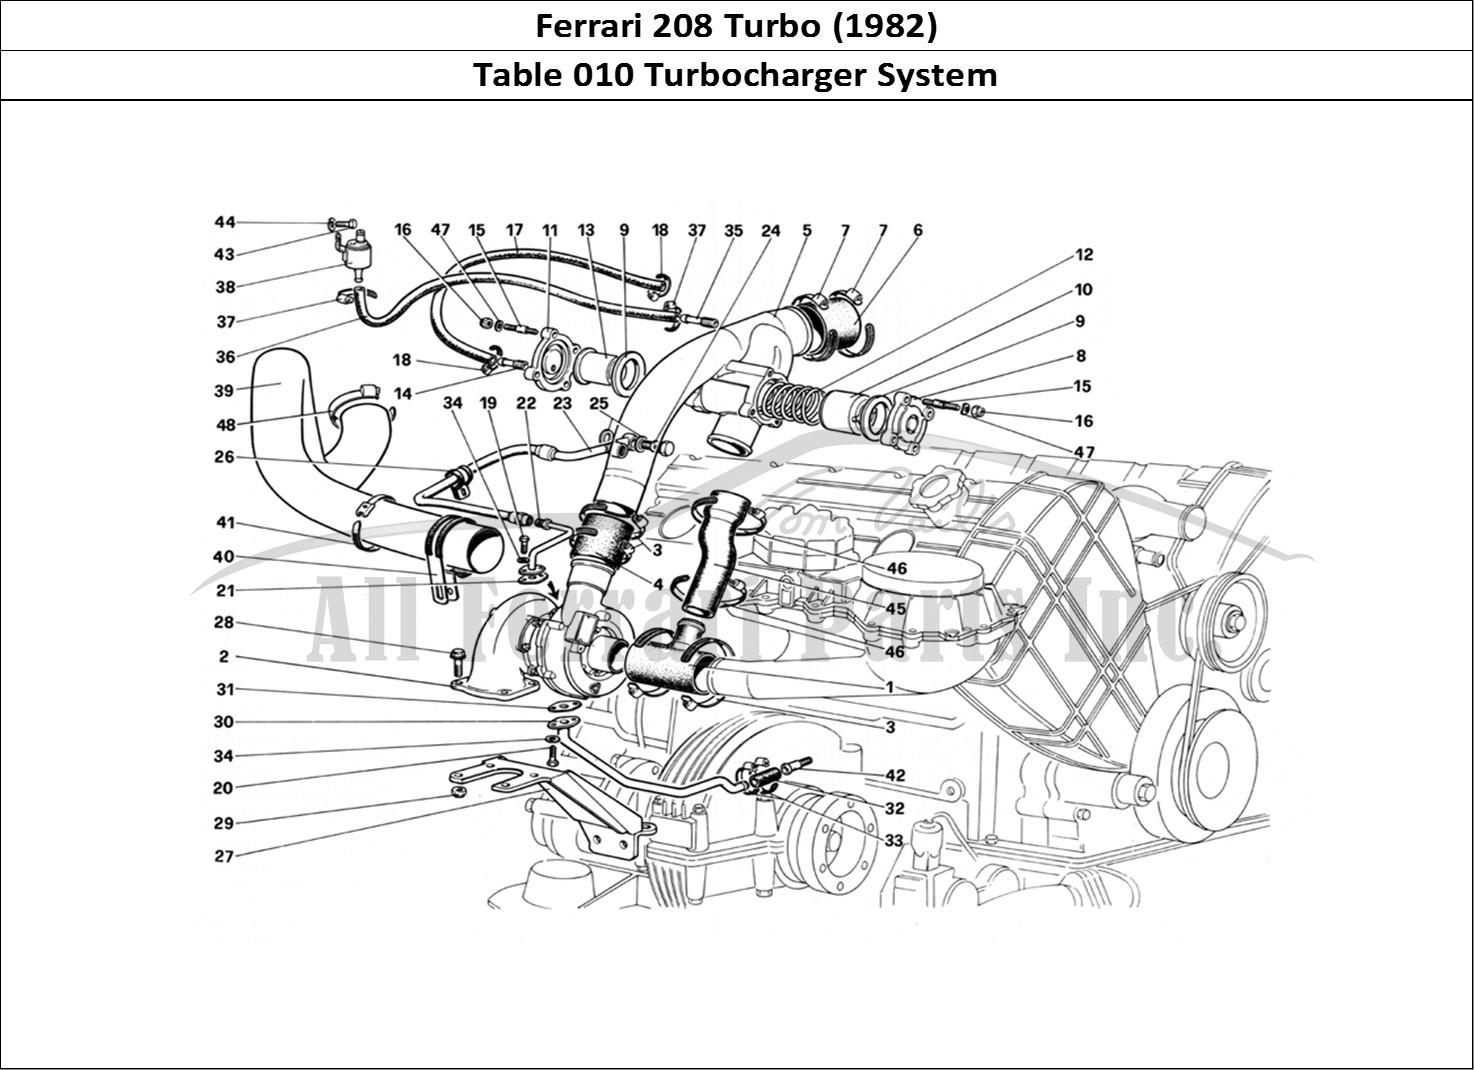 hight resolution of ferrari 208 turbo 1982 mechanical table 010 turbocharger system